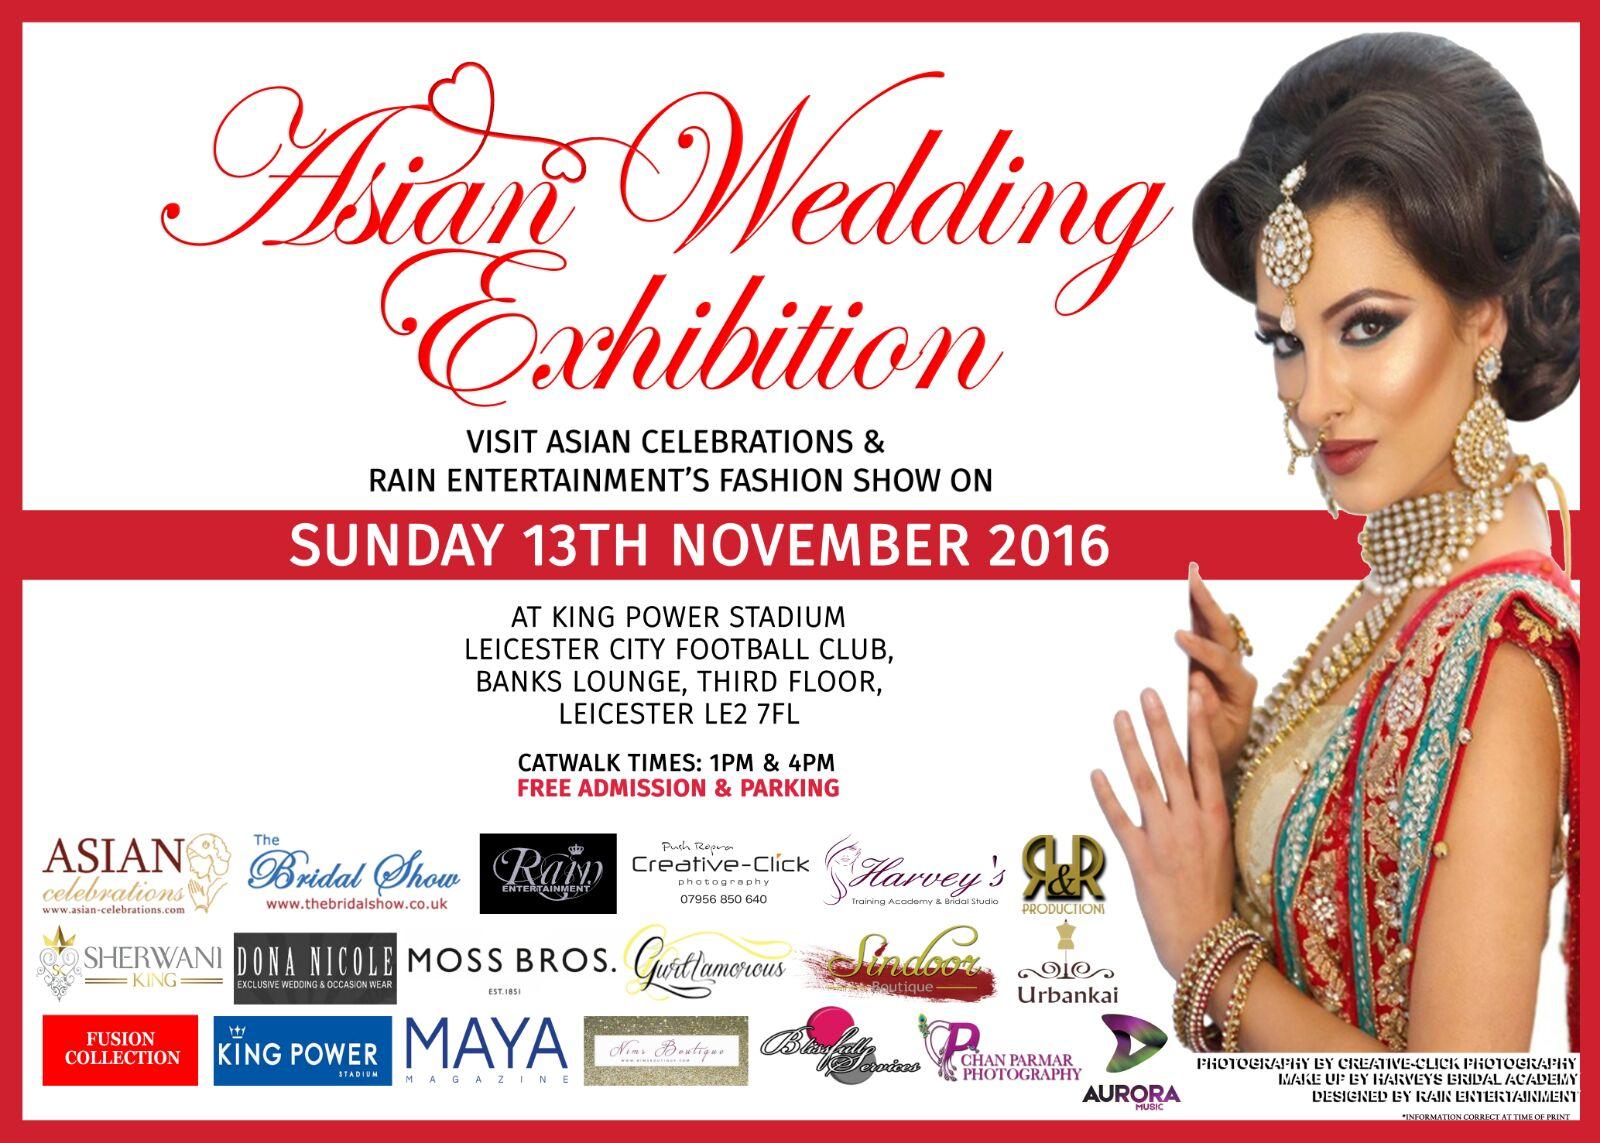 Rain Entertainment On Twitter Asian Wedding Exhibition Fashion Show Sunday 13th November 2016 Leicester City Football Club